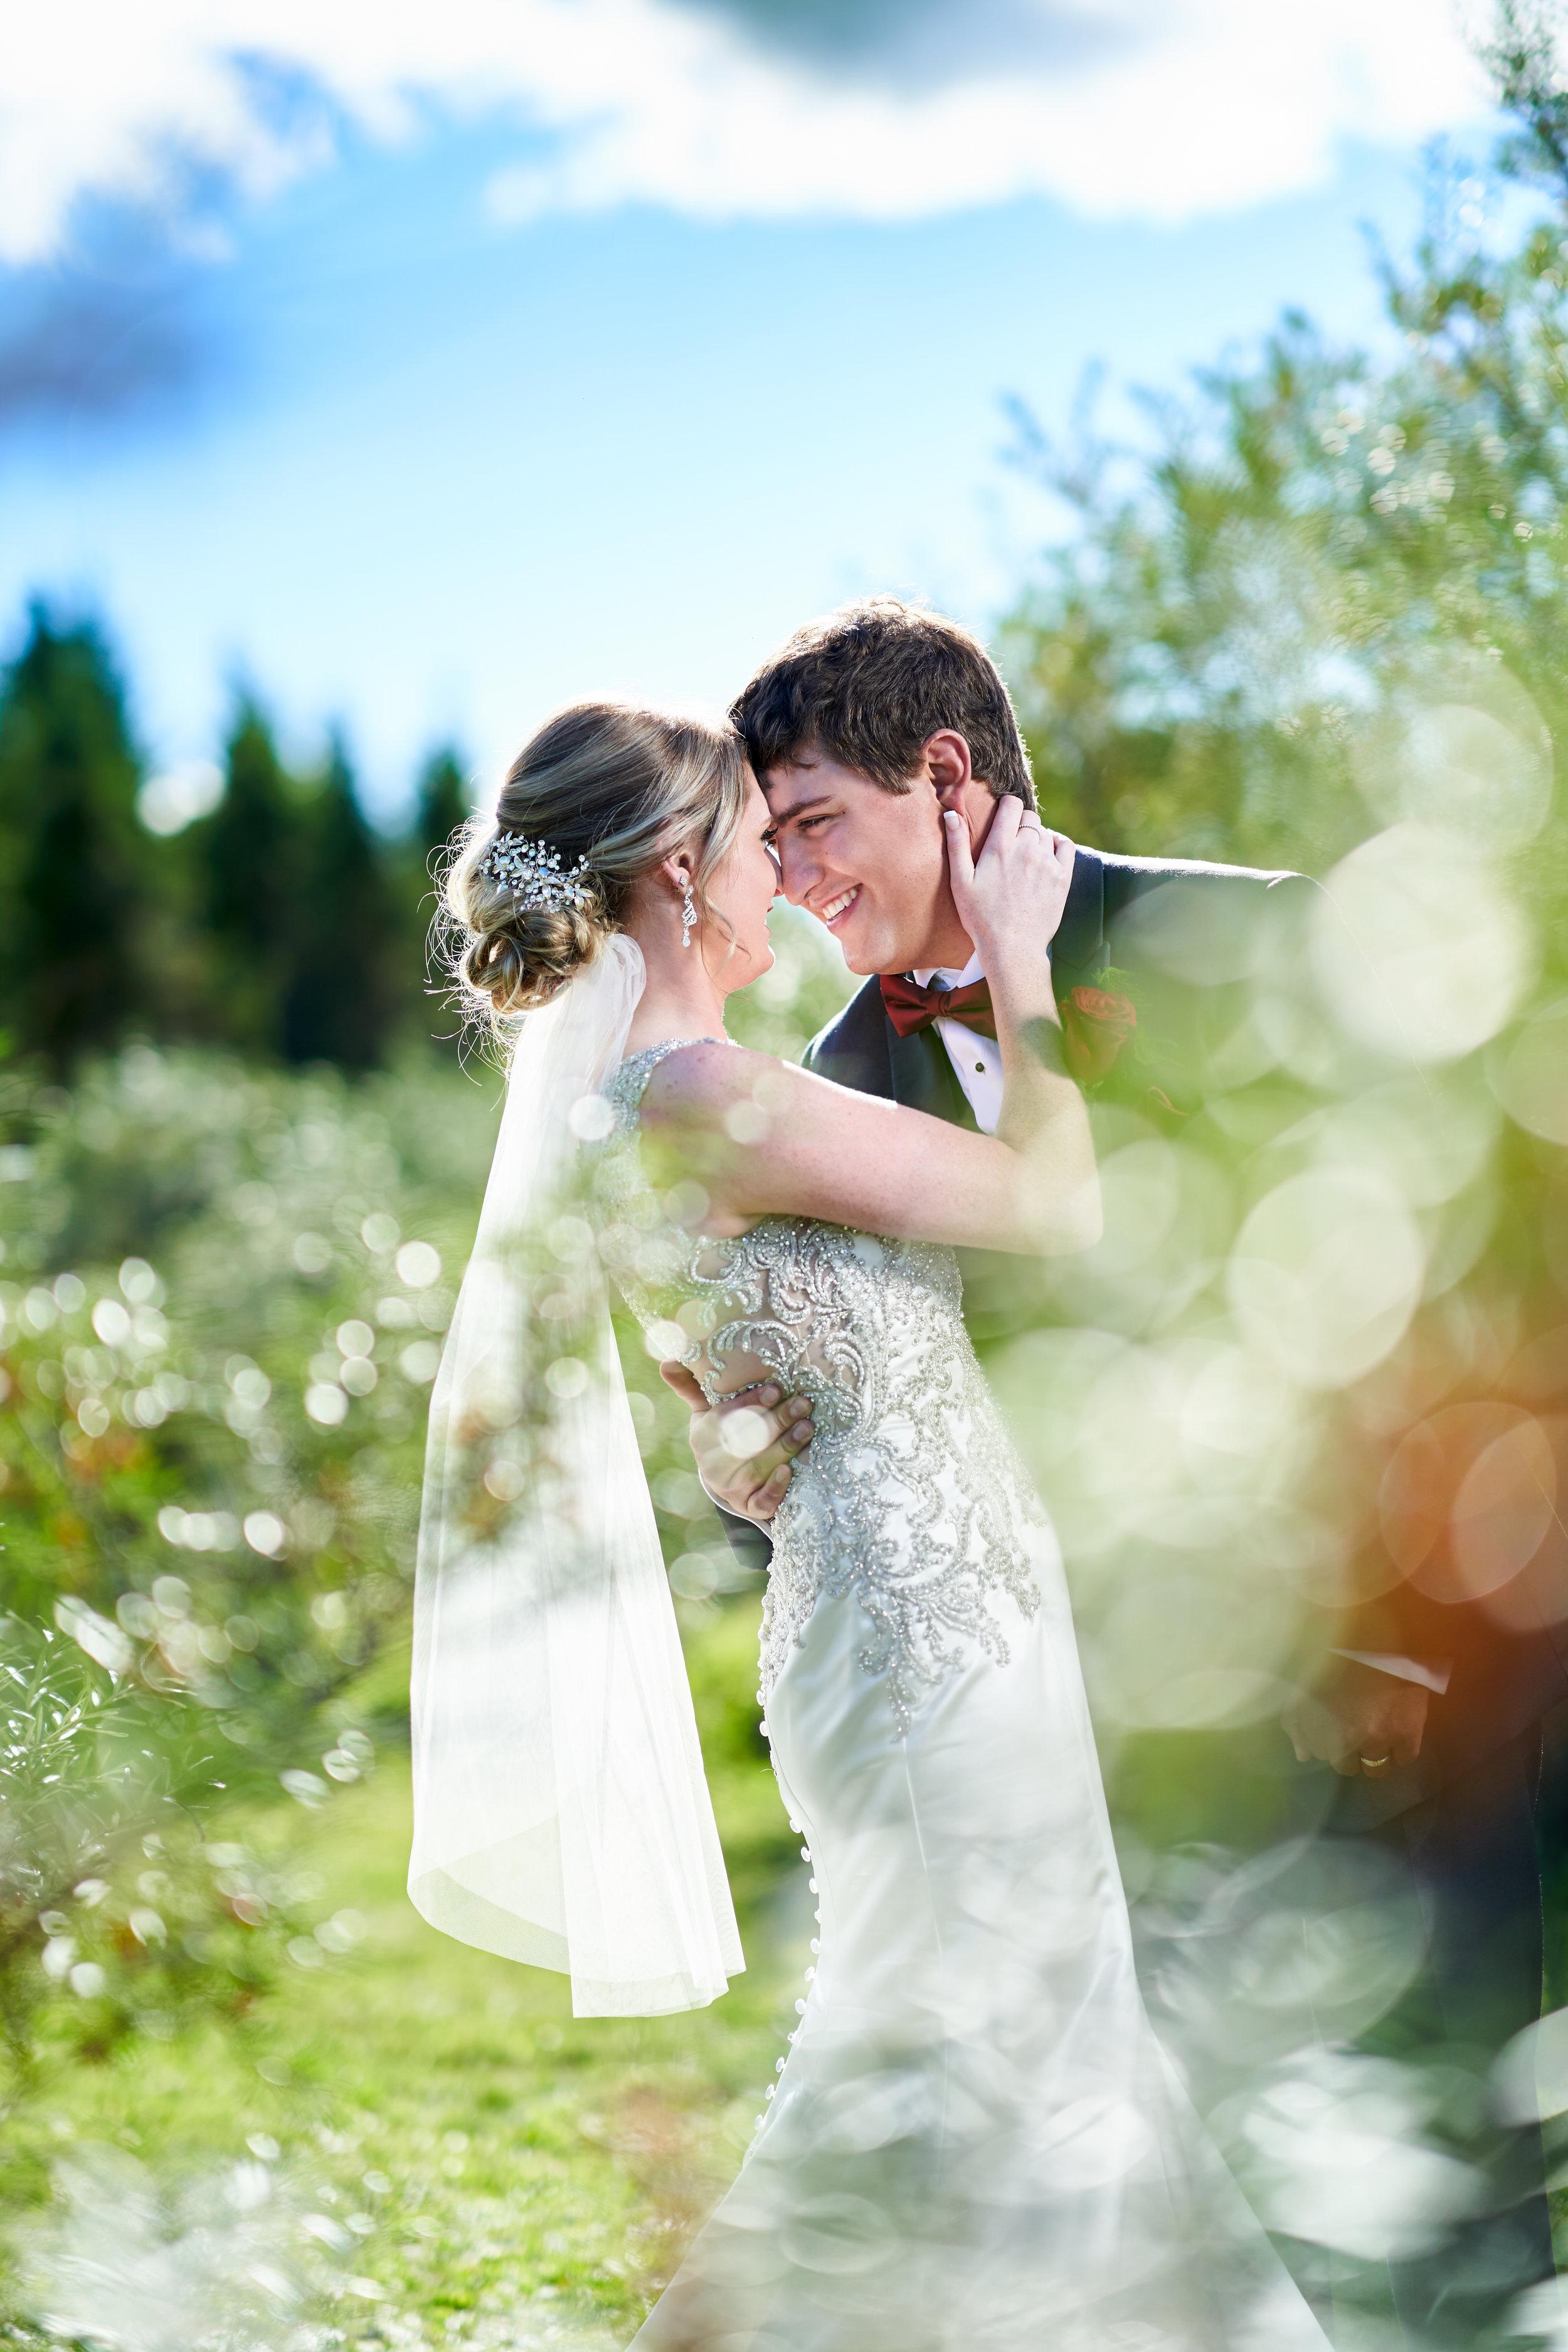 Shelby & Michael's Wedding - 480.jpg